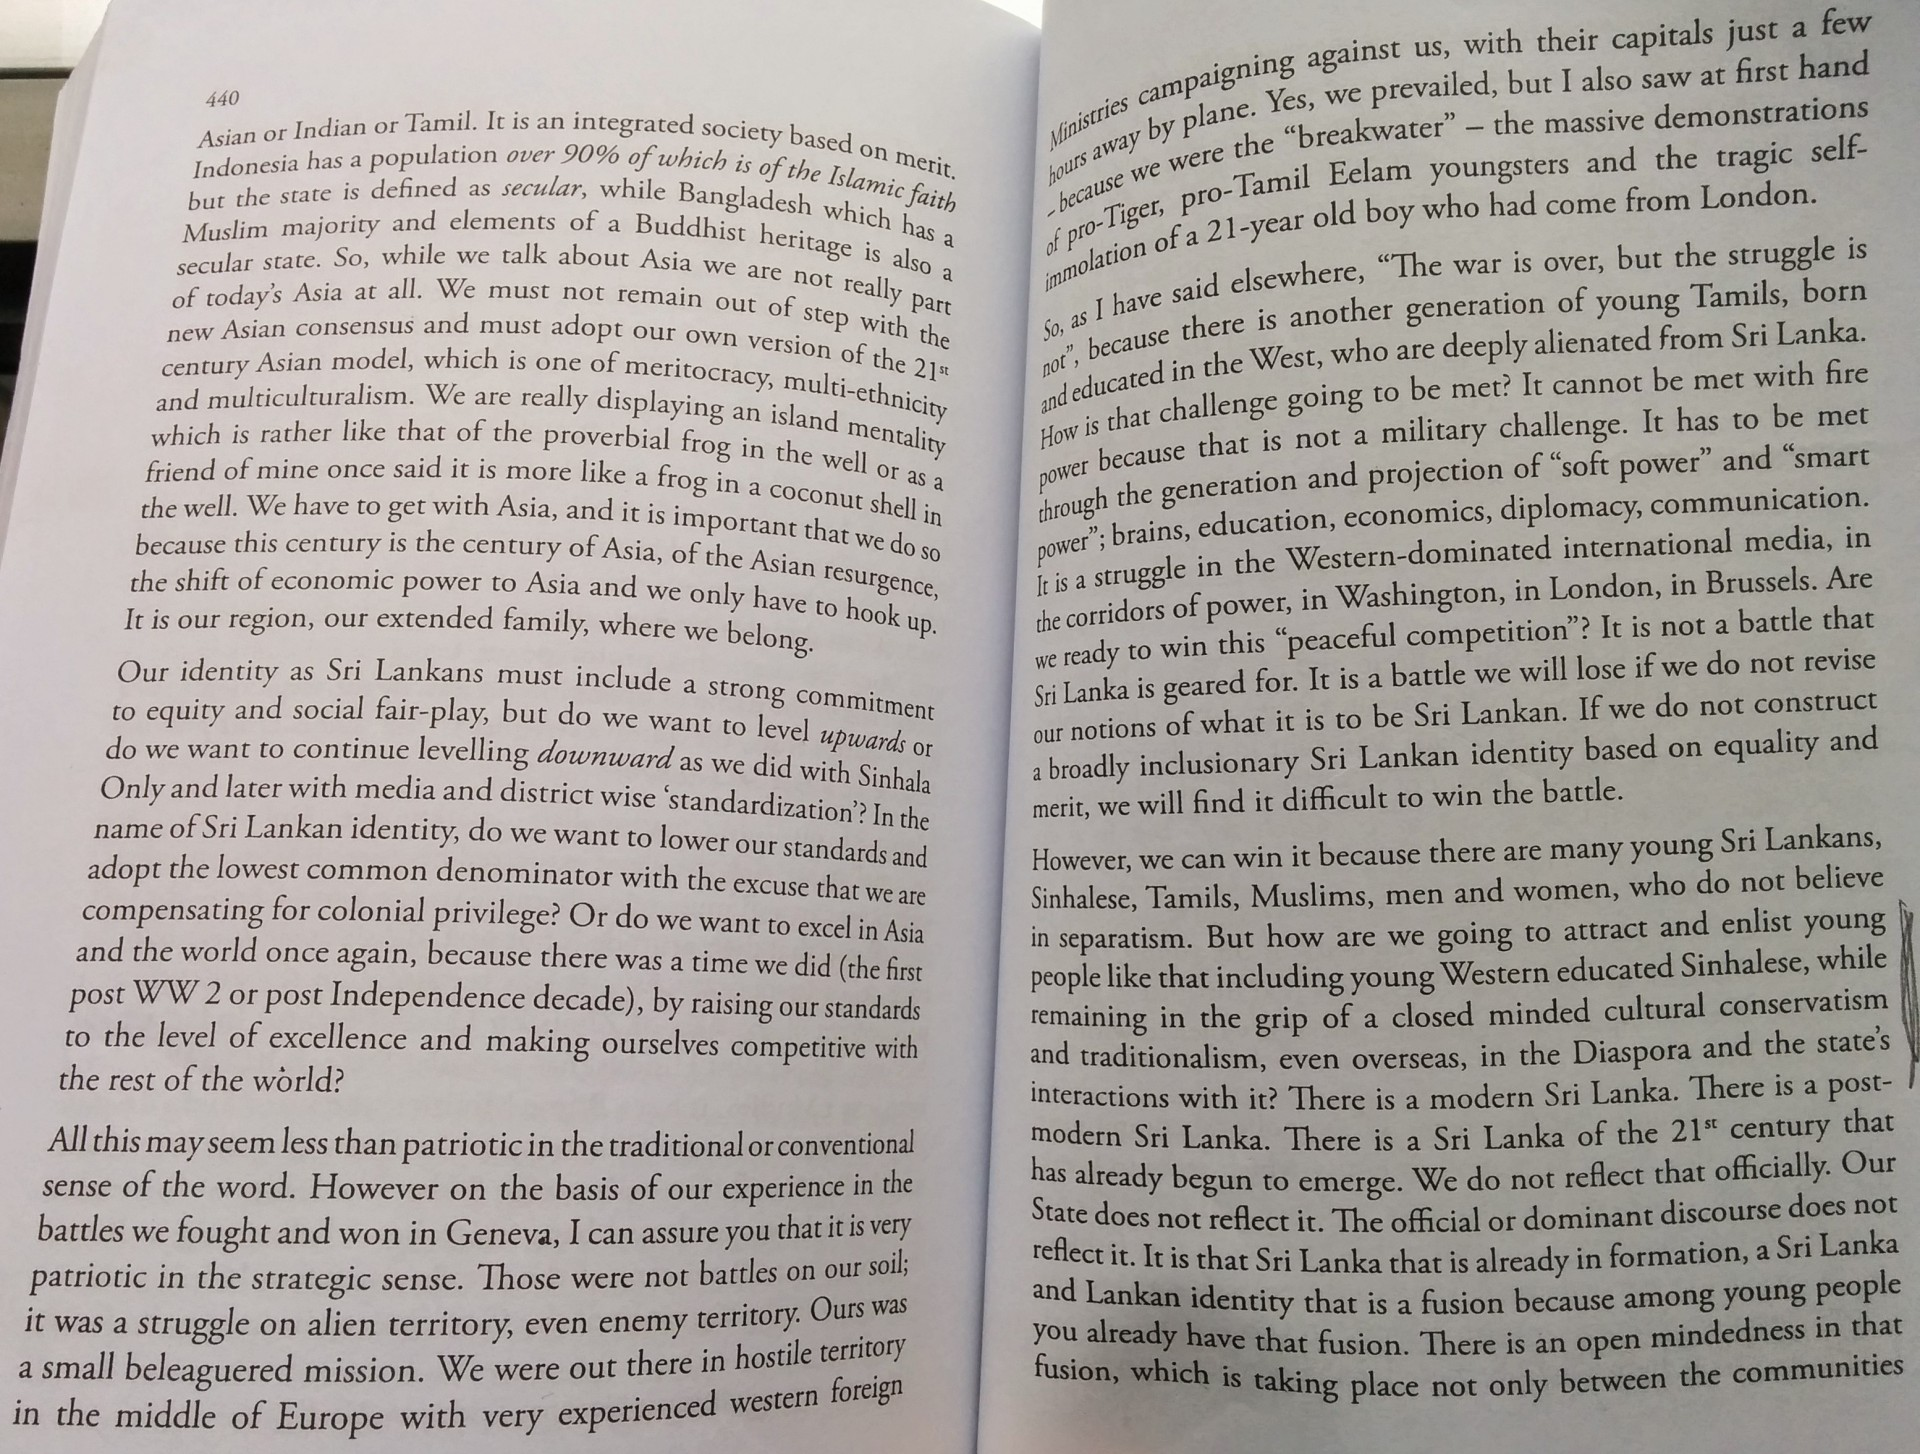 009 Natural Resources In Sri Lanka Essay Fantastic 1920